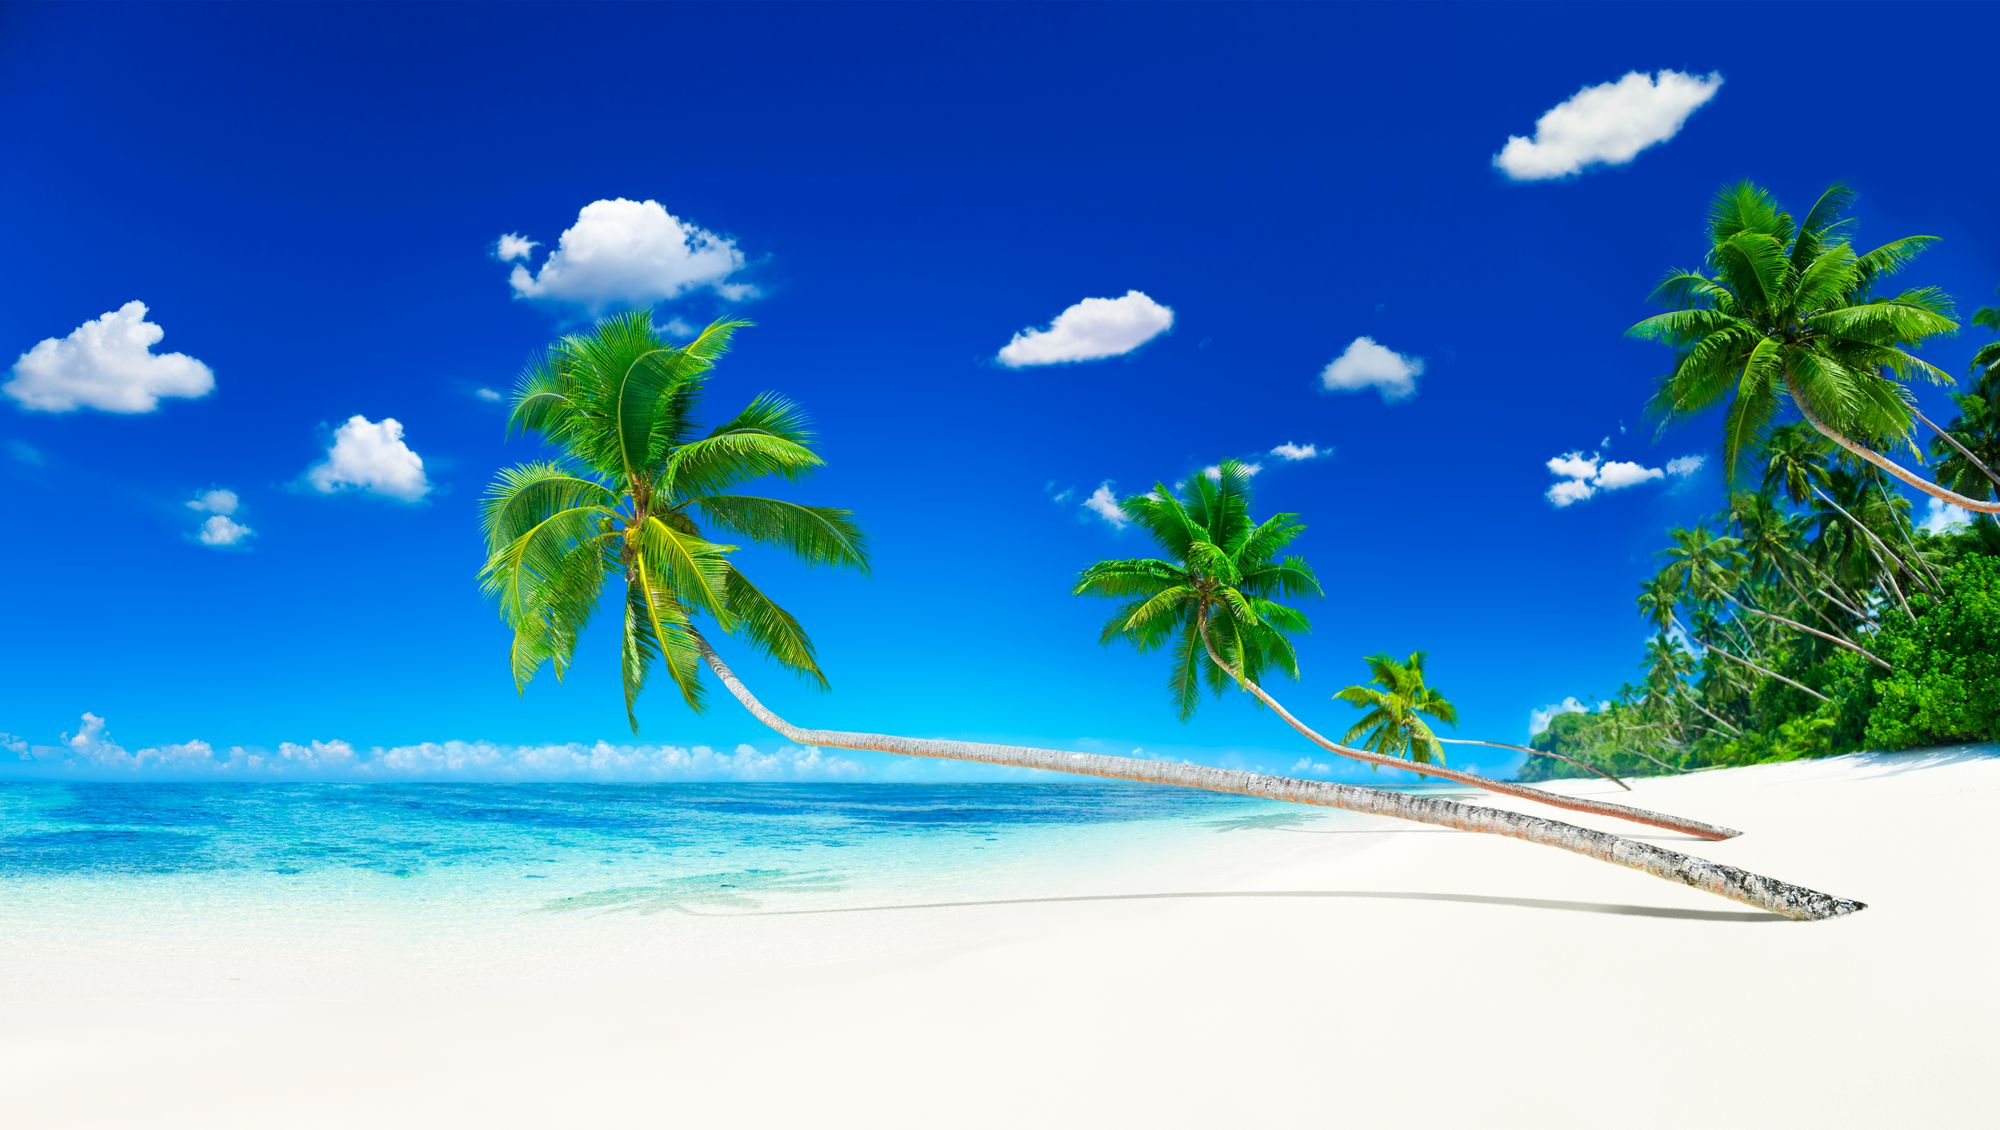 Island-image-from-rawpixel-id-95328-jpeg